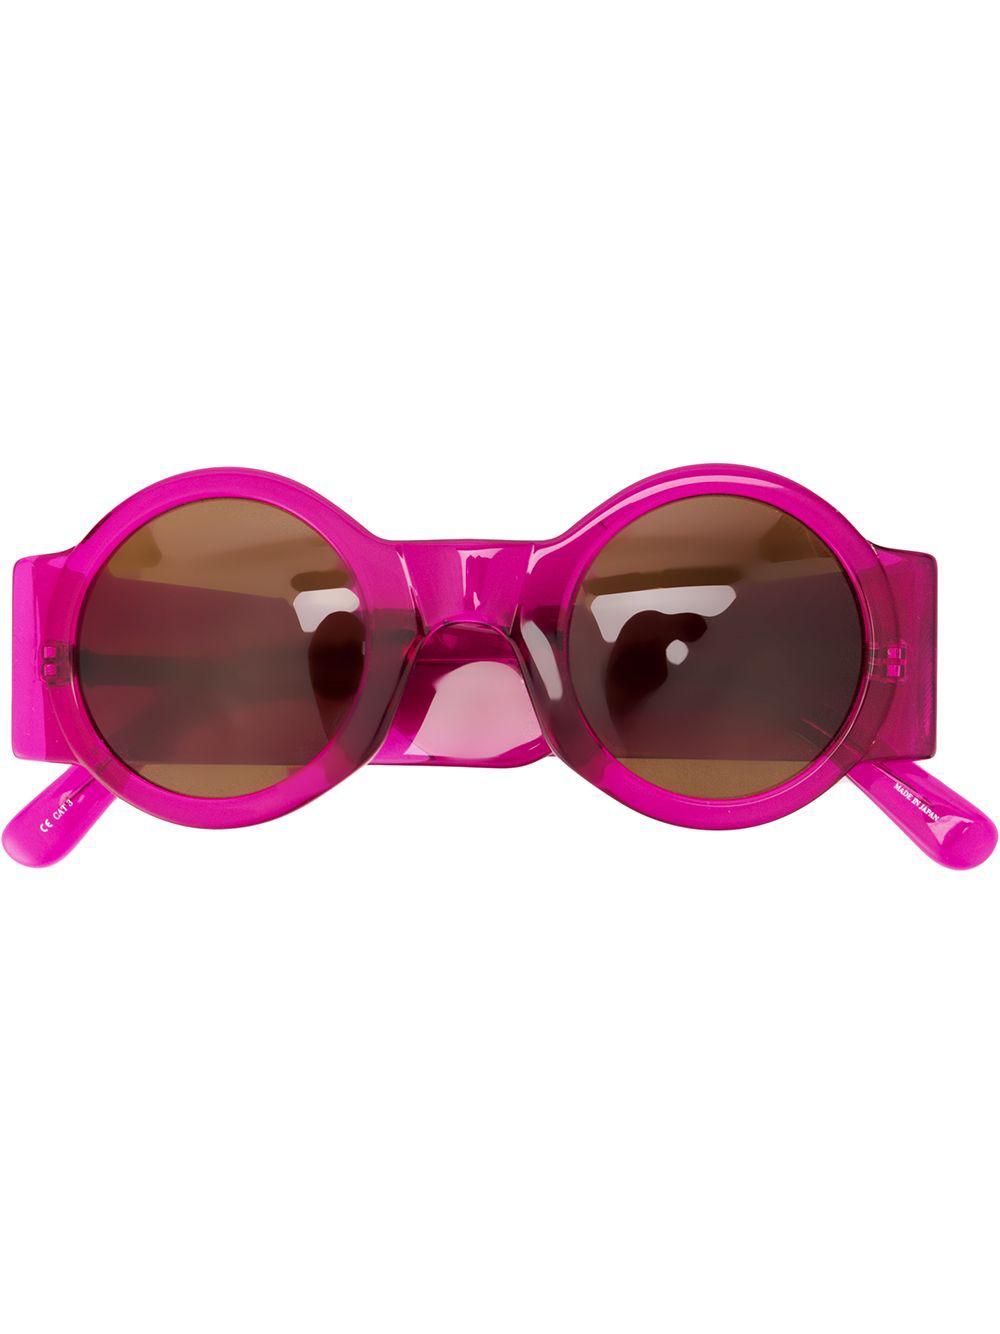 7e33db8c6387 Linda Farrow Dries Van Noten 98 C16 Sunglasses - Purple In 紫色 ...